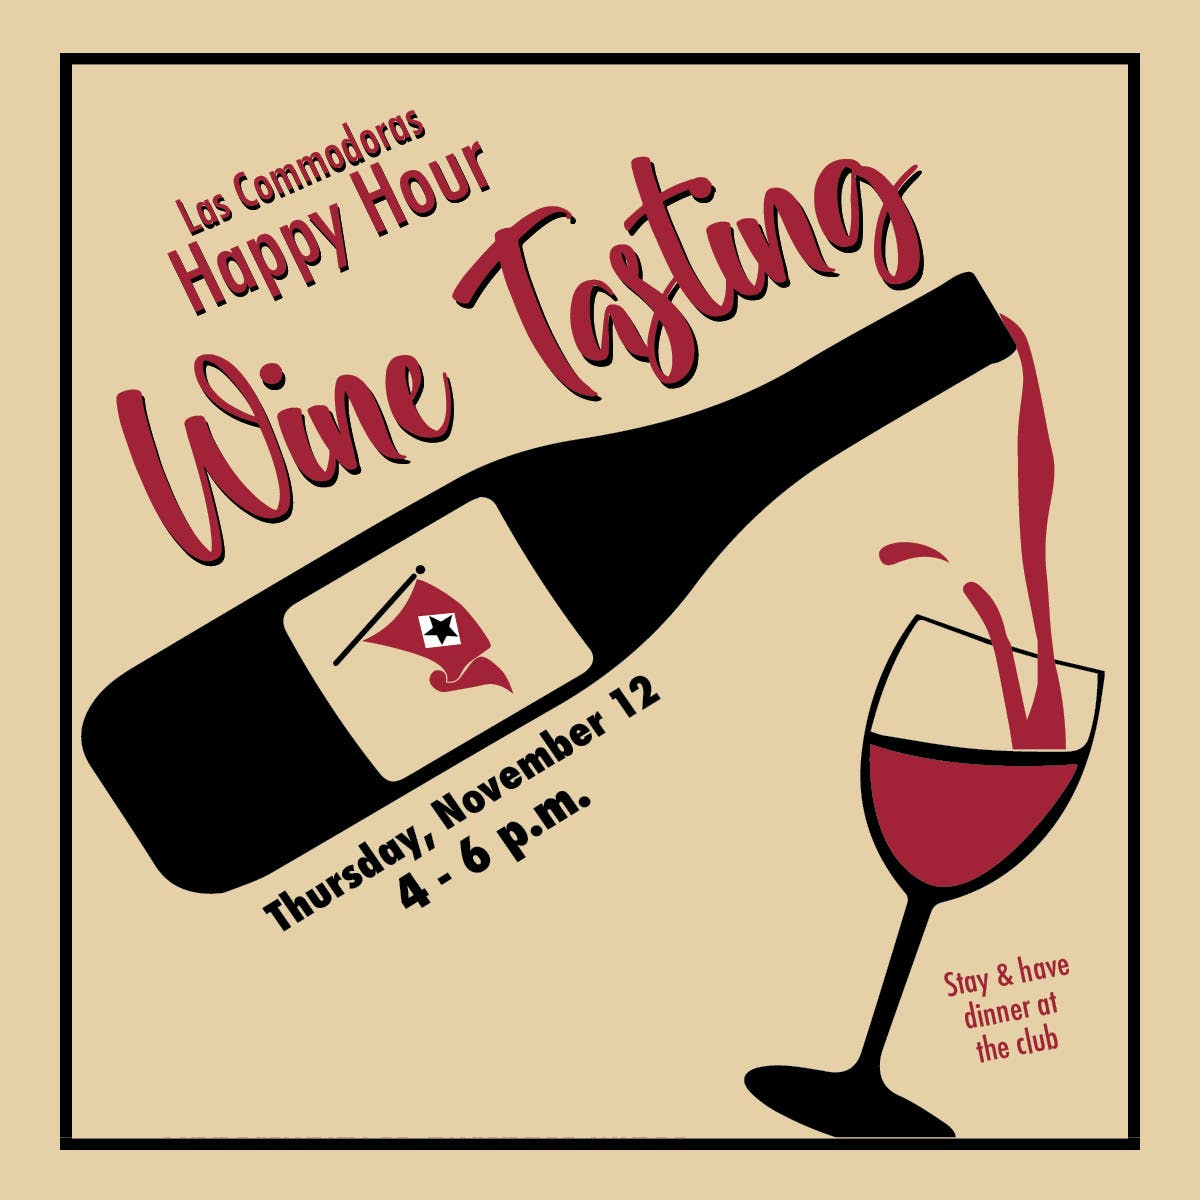 Las Commodoras Wine Tasting